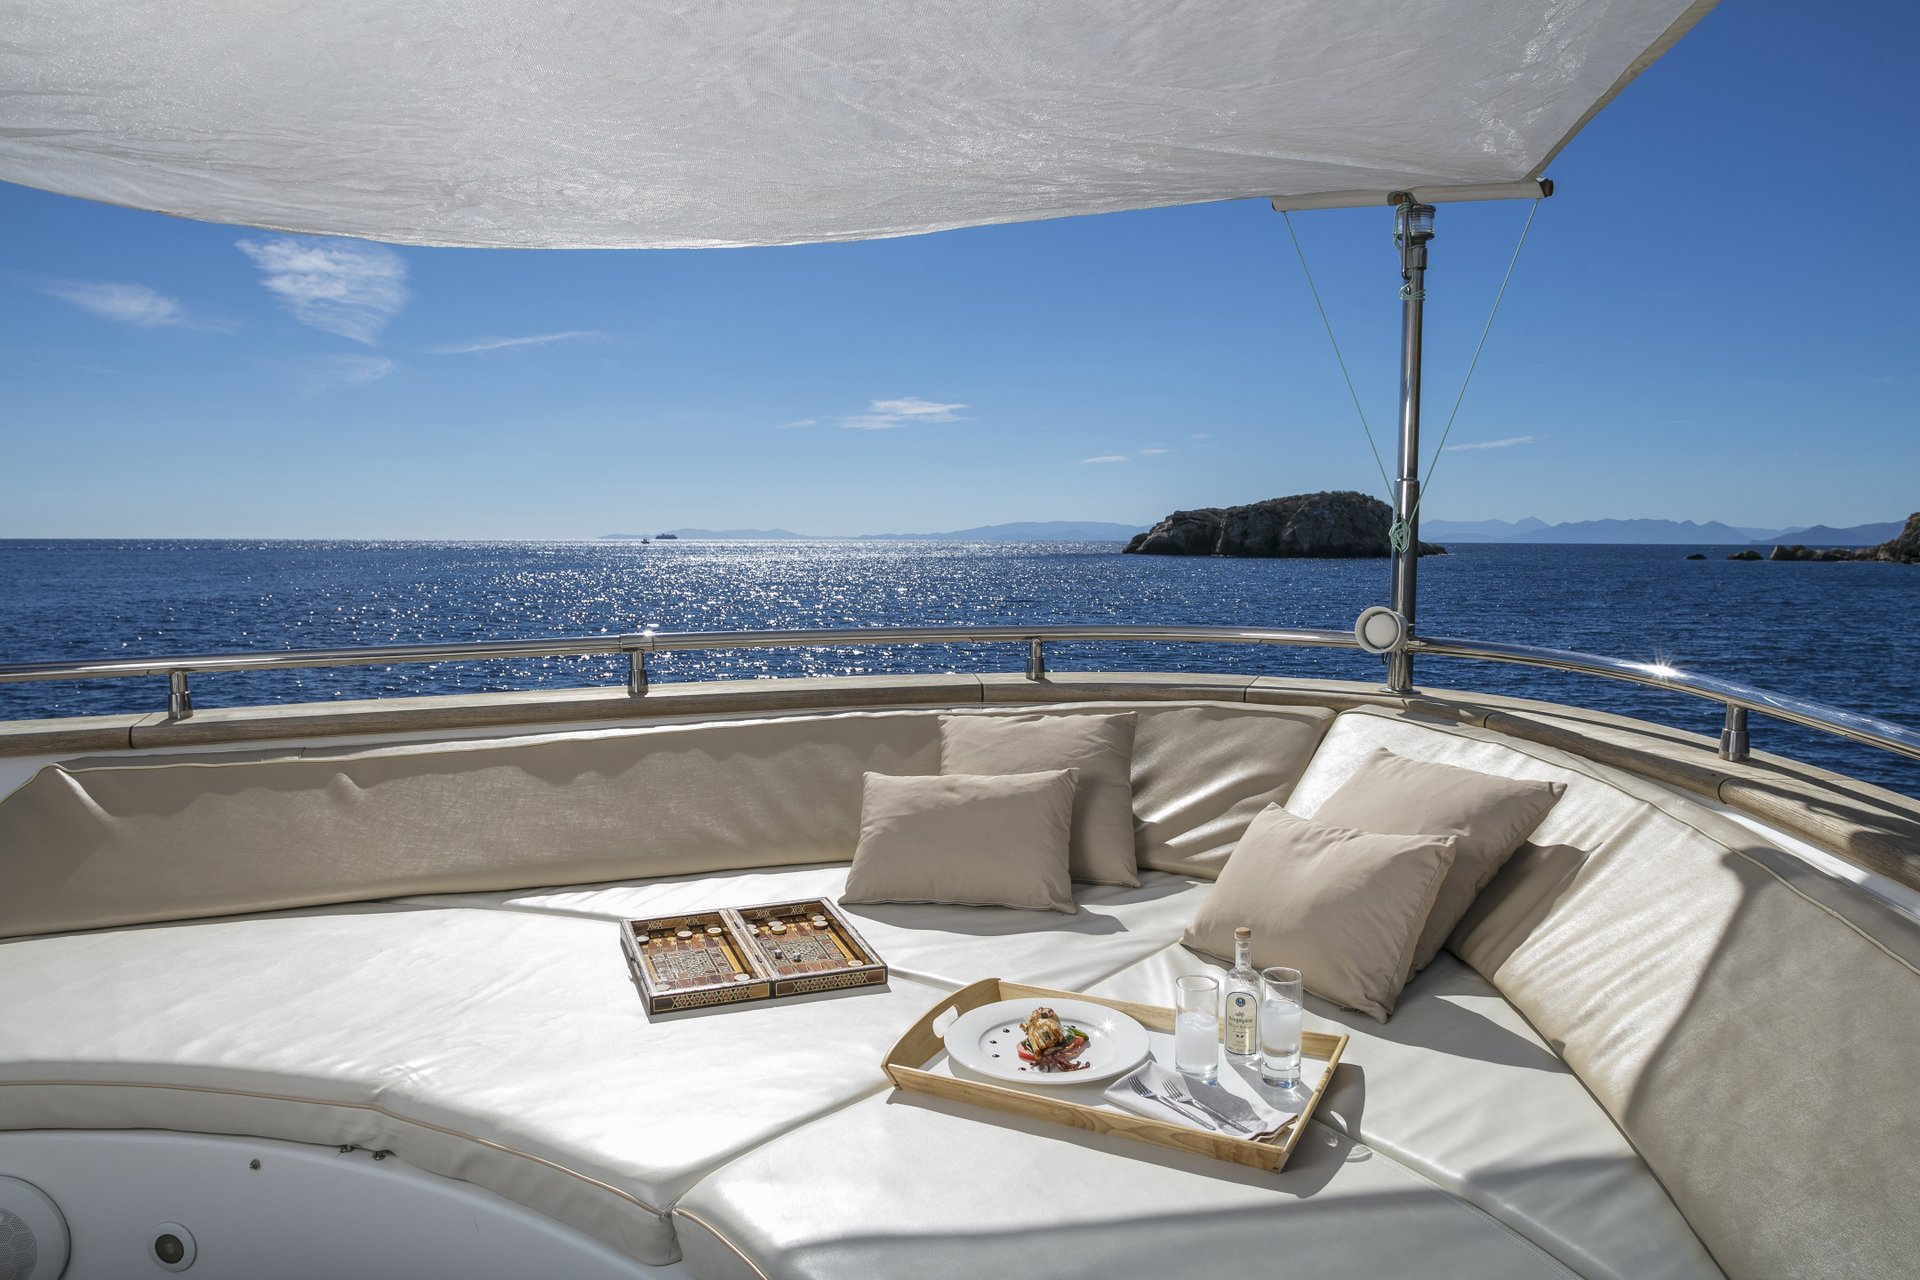 M/Y PARIS A yacht for charter deck lounge area